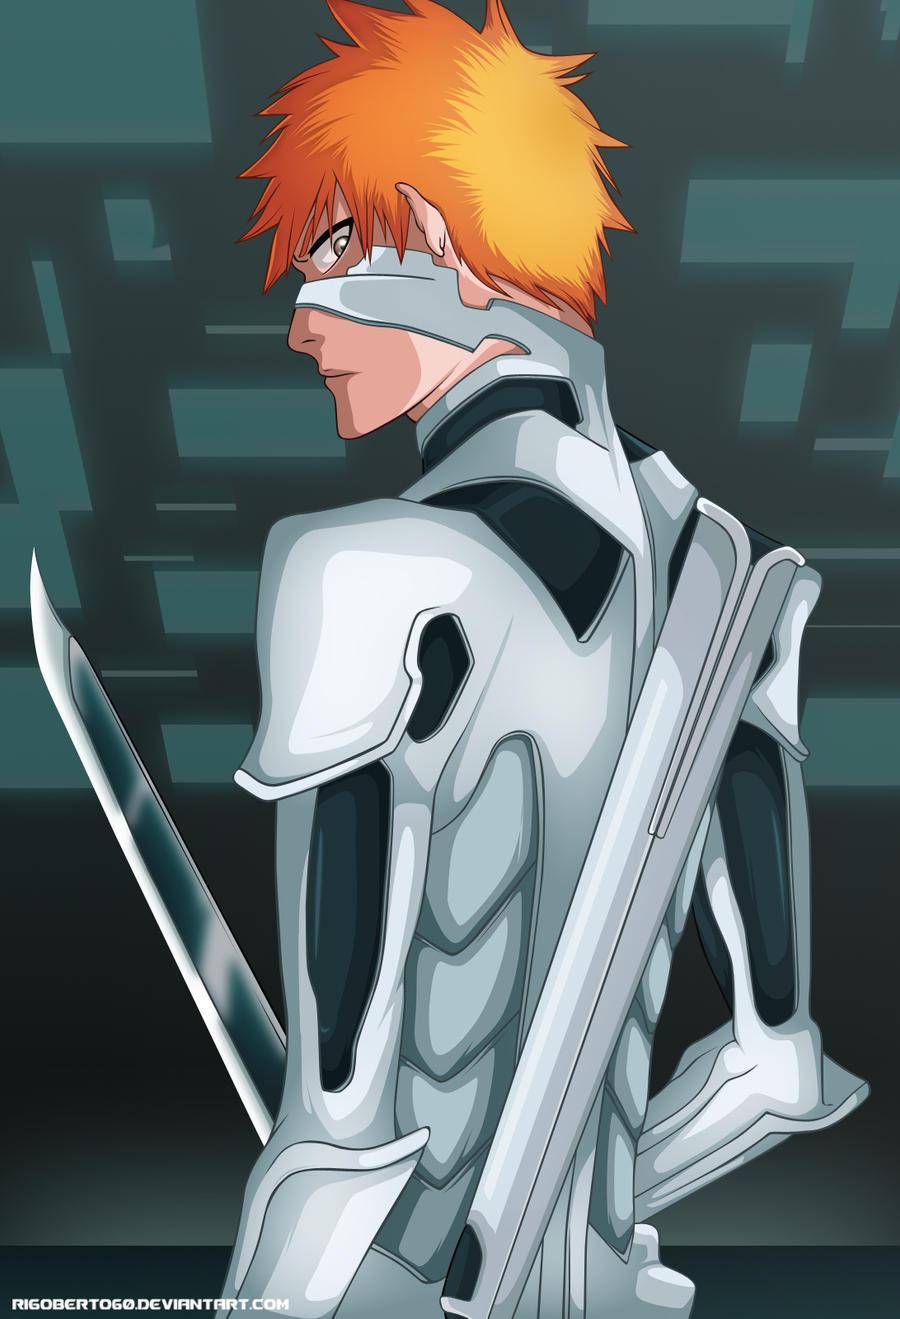 Fullbring2: My sword by Rigoberto60